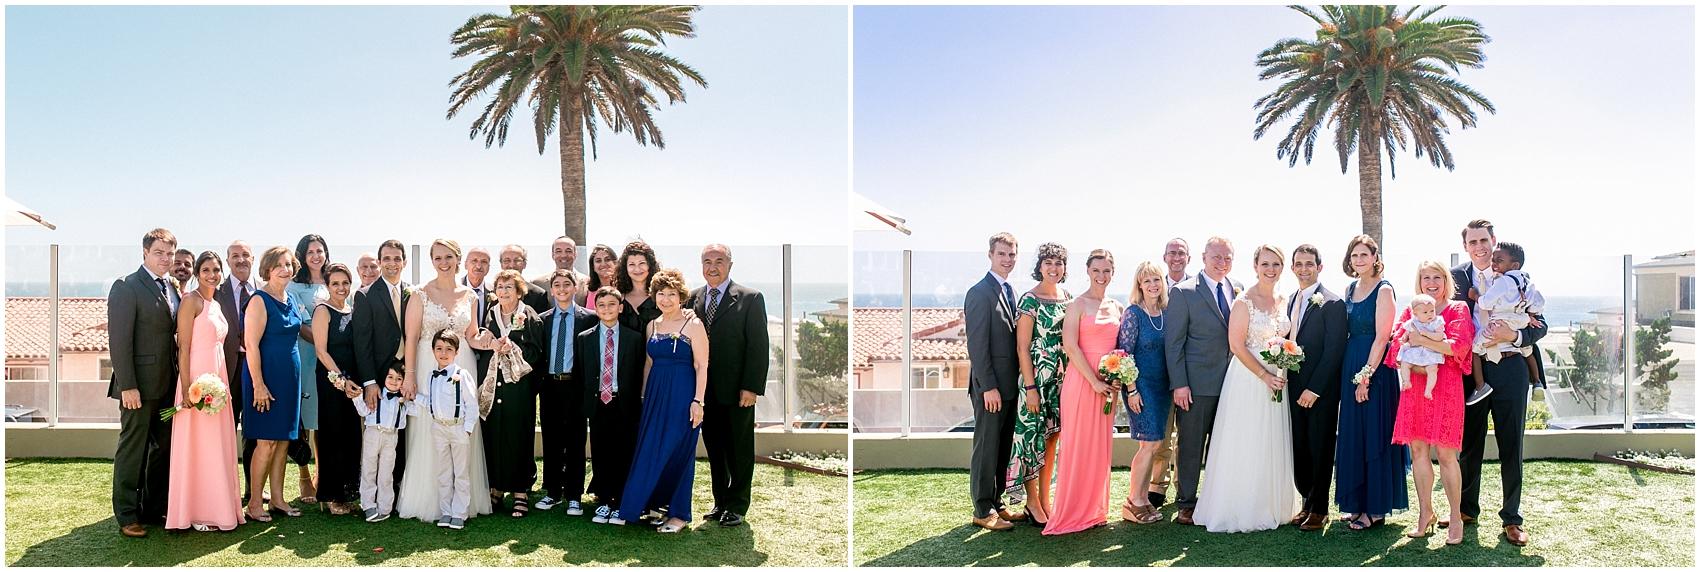 Jen and Mark's Wedding-0525.jpg